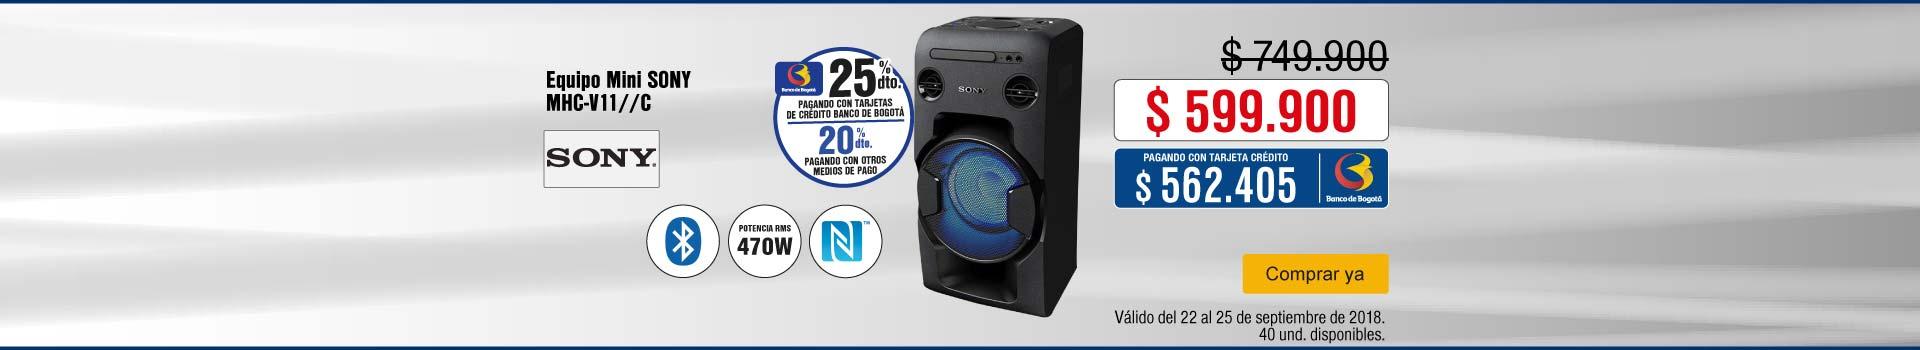 AK-KT-BCAT-2-audio-PP---Sony-MHC-V11//C-Sep22